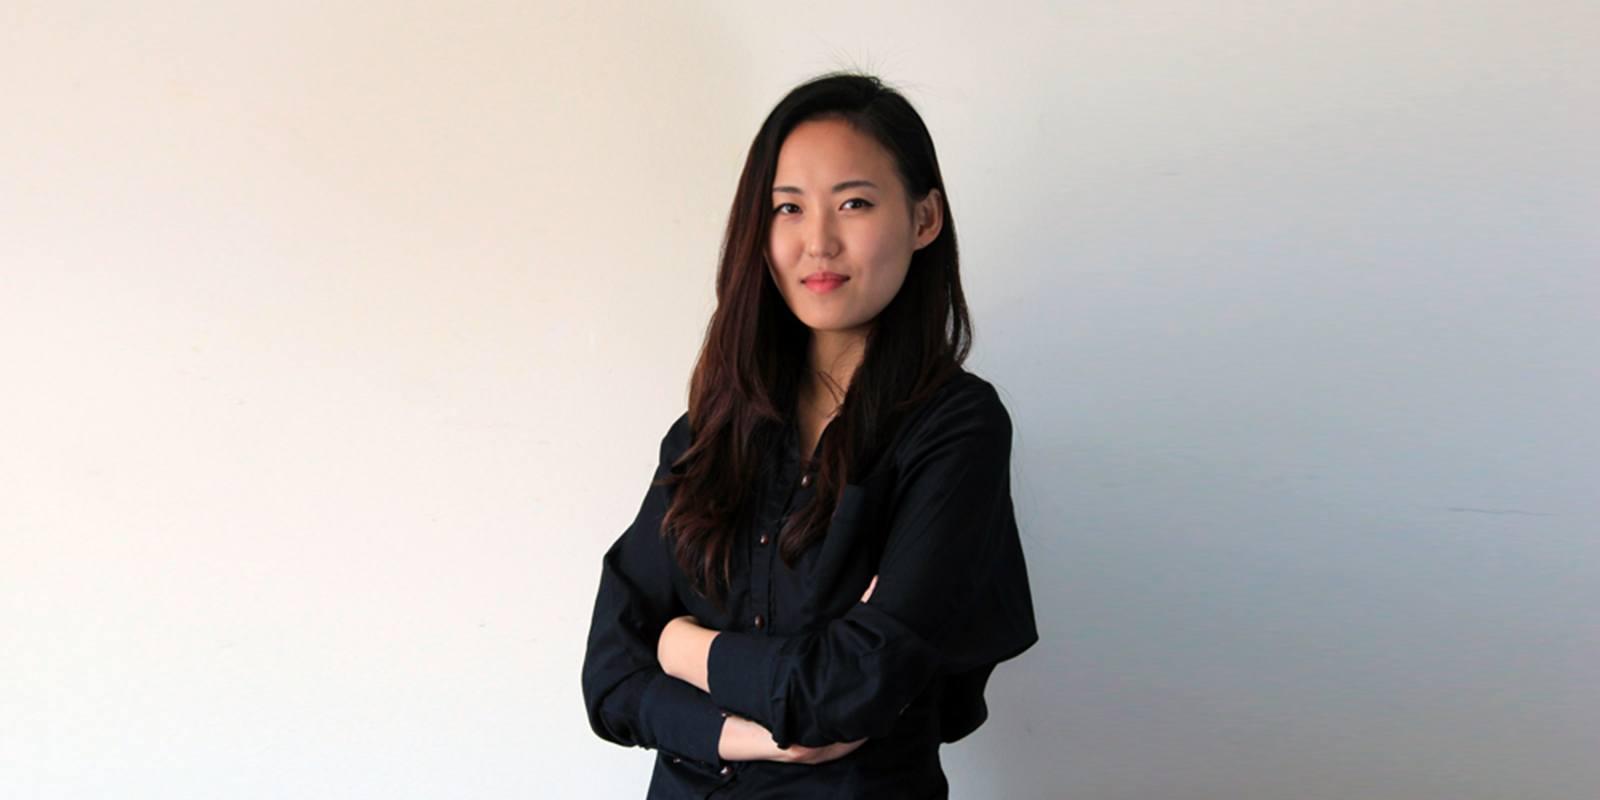 Hyunhee Hwang - Creator and Designer of concept Nurture